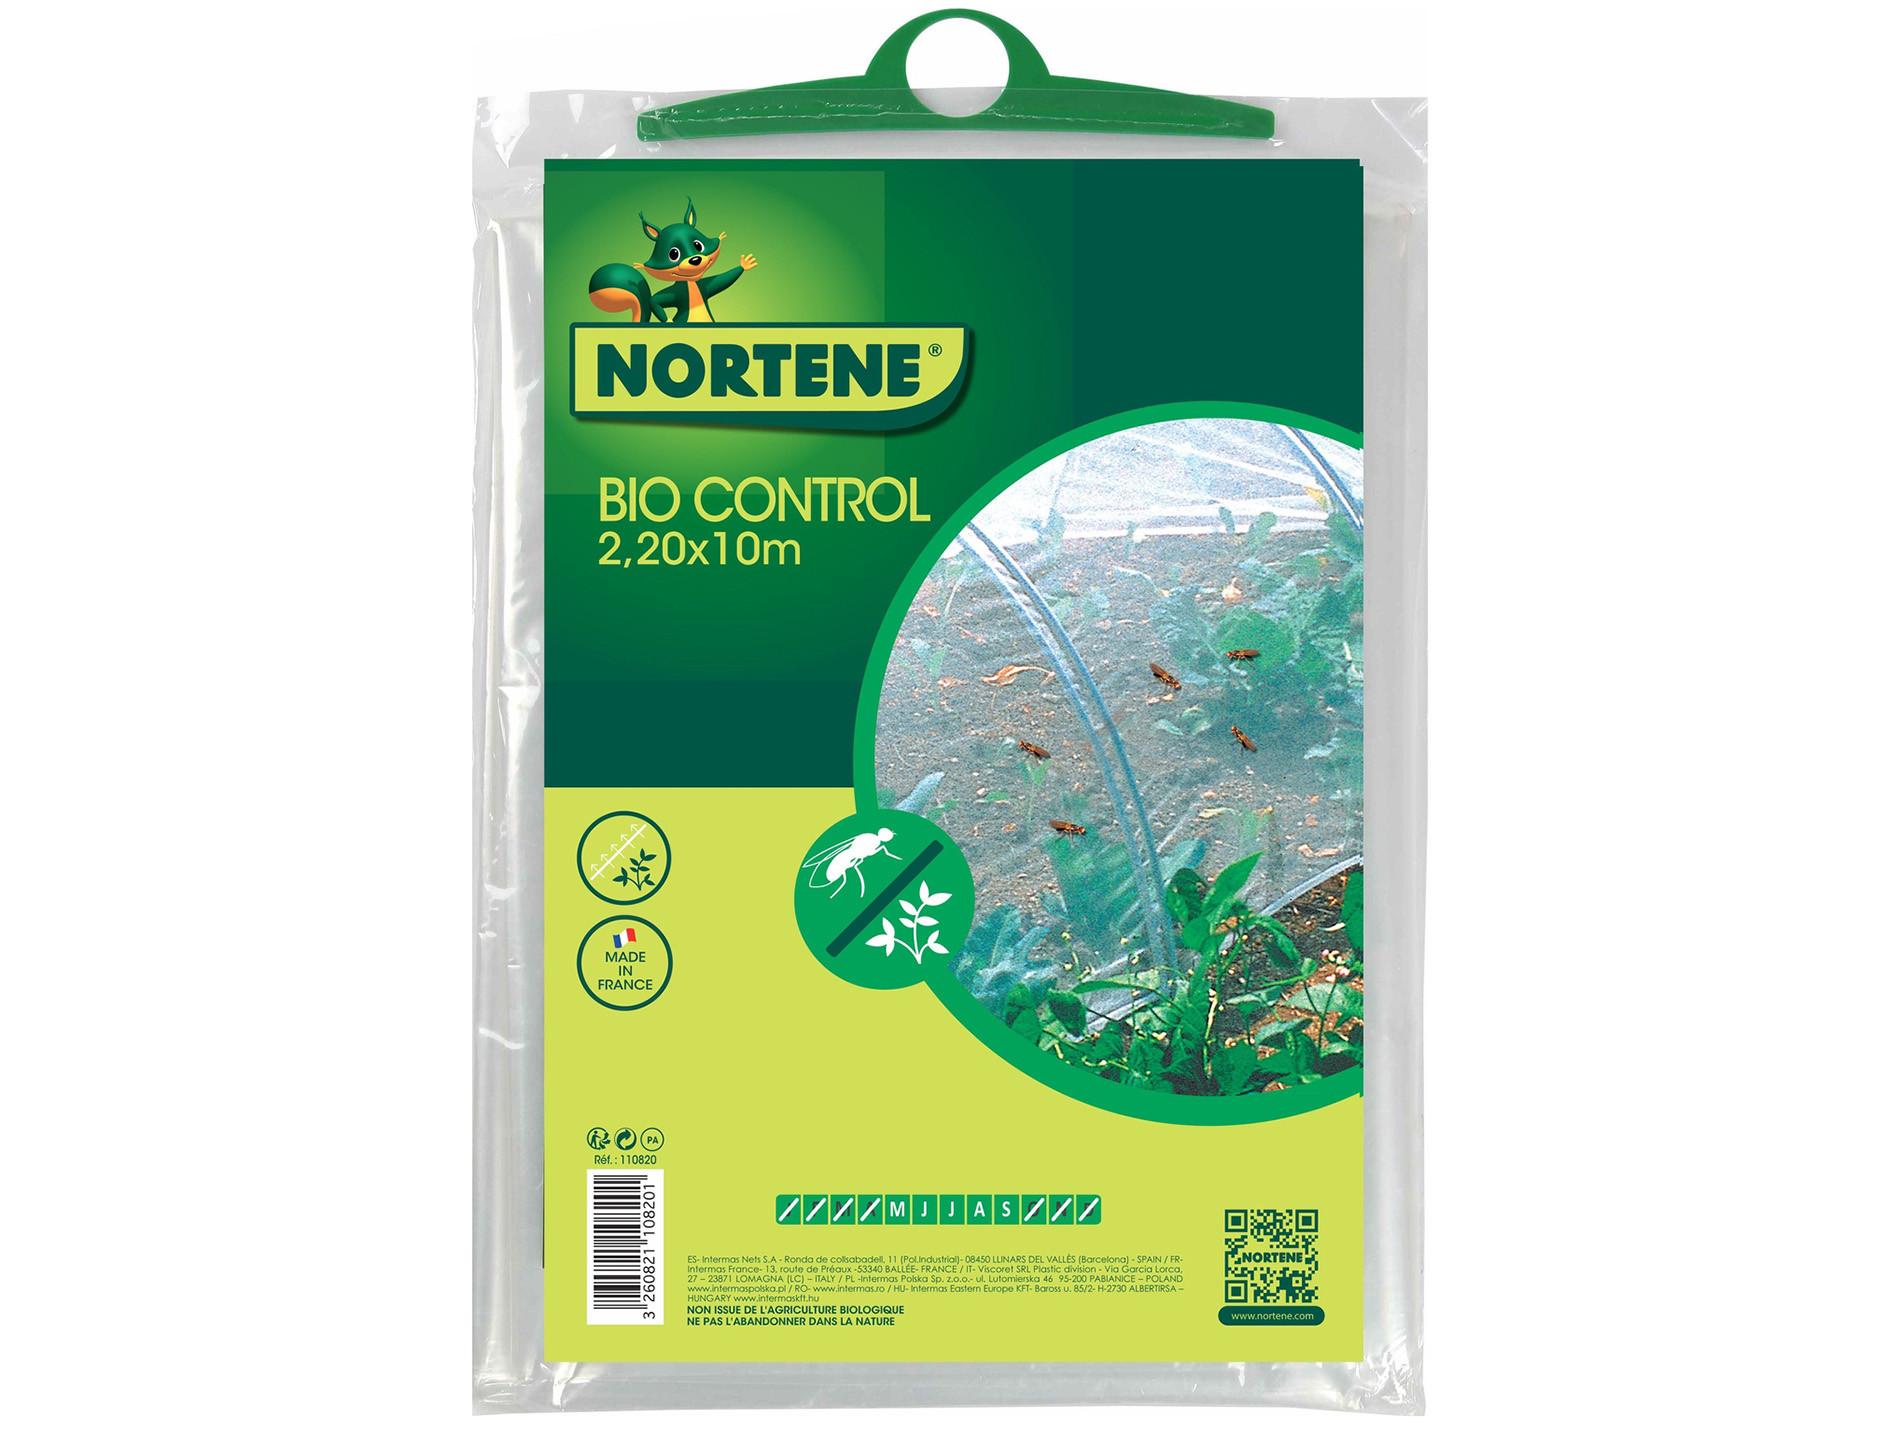 Filet anti-insectes Biocontrol 2,20x10m